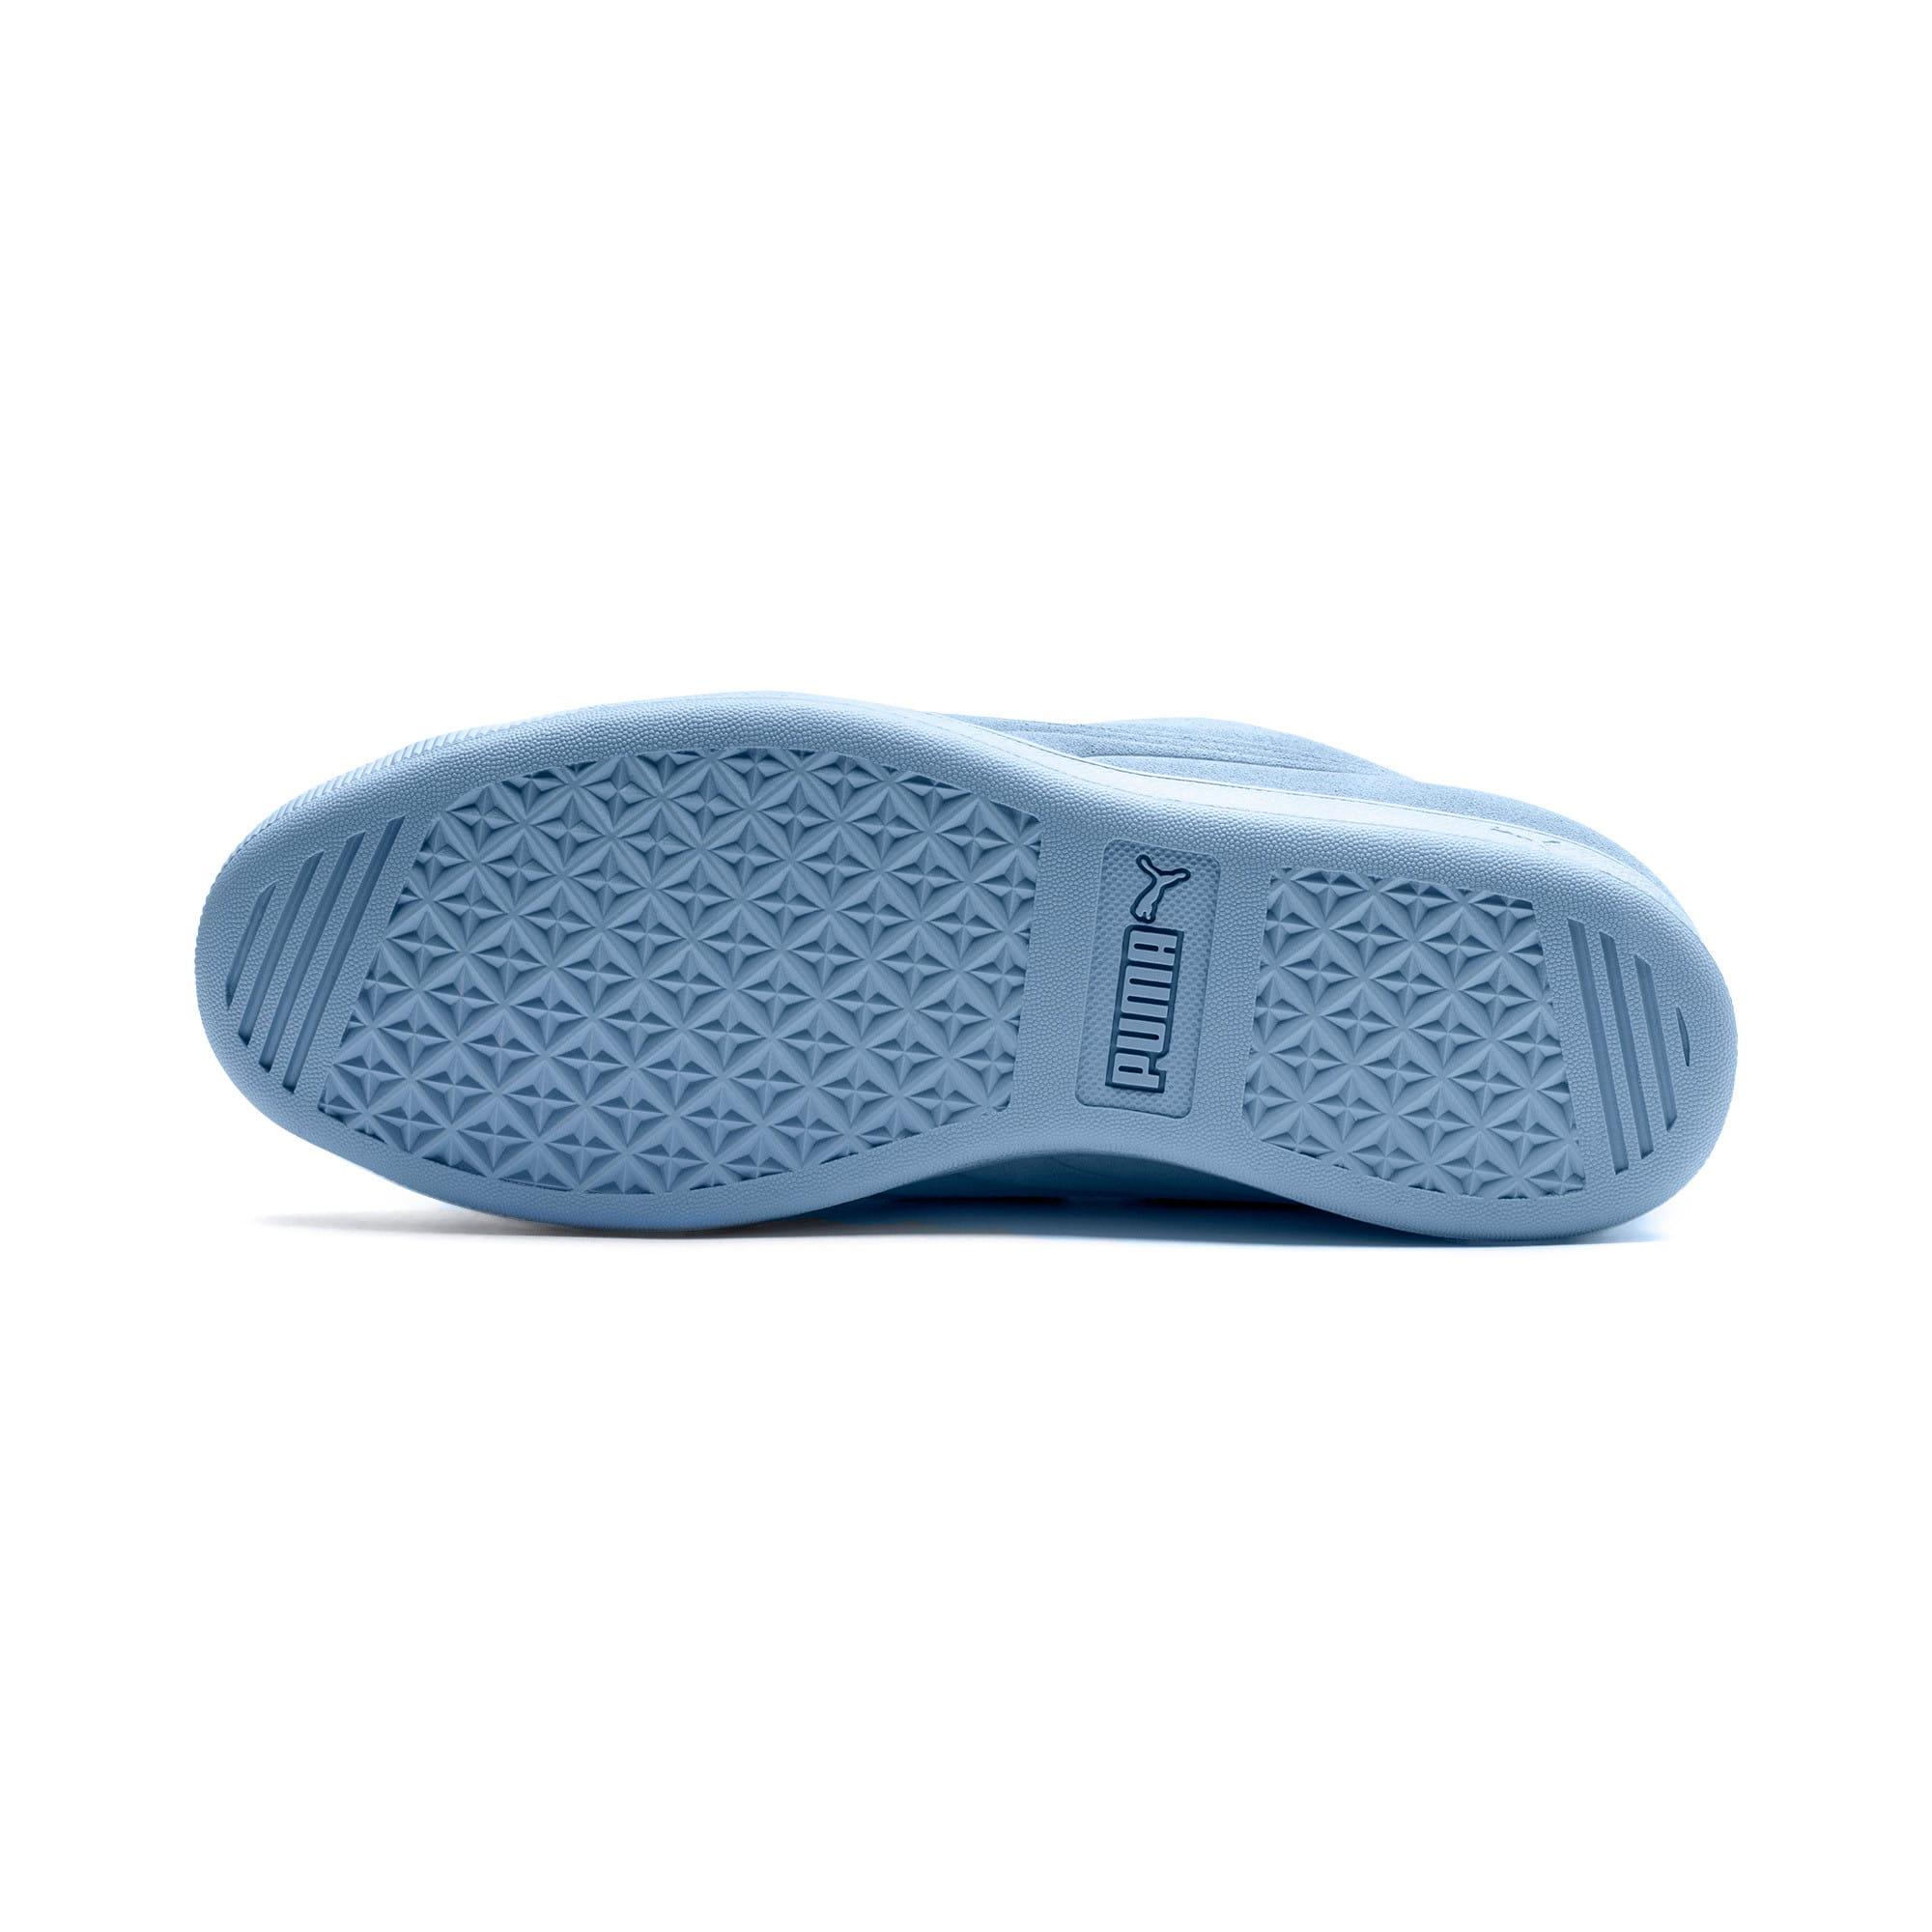 Thumbnail 3 of Vikky Ribbon Satin Women's Sneakers, CERULEAN-CERULEAN, medium